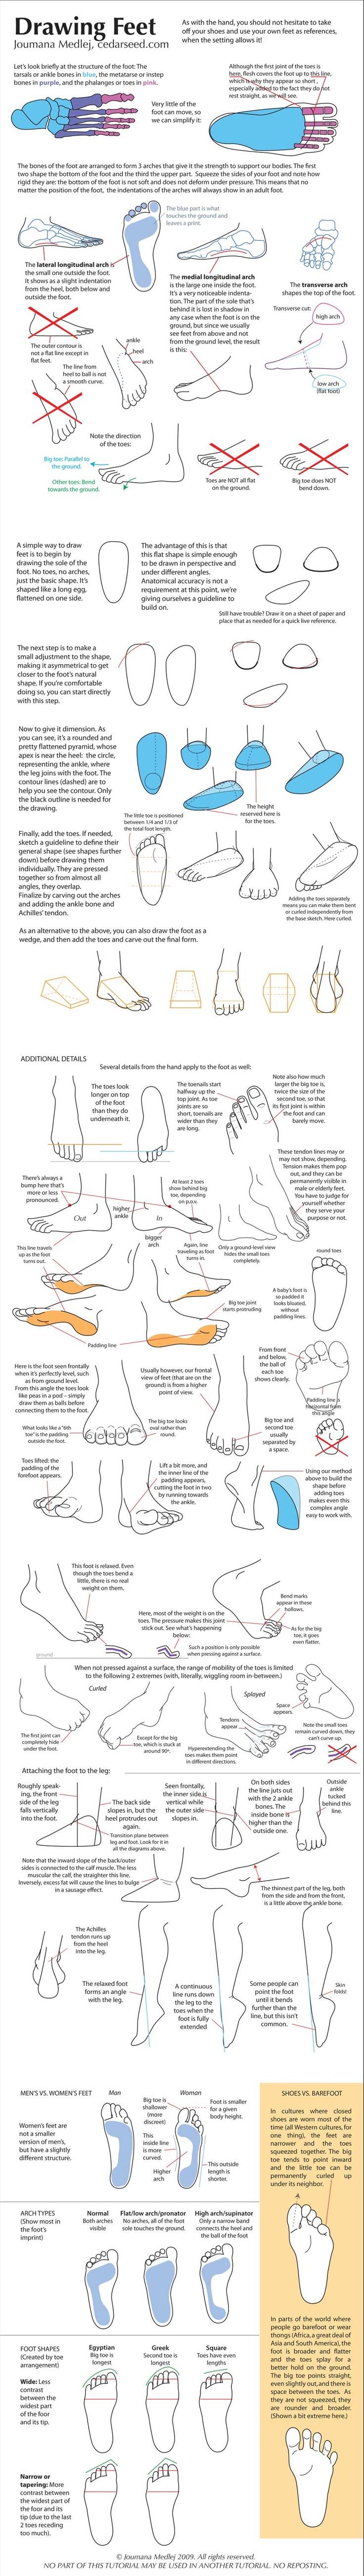 Drawing Feet by `majnouna on deviantART